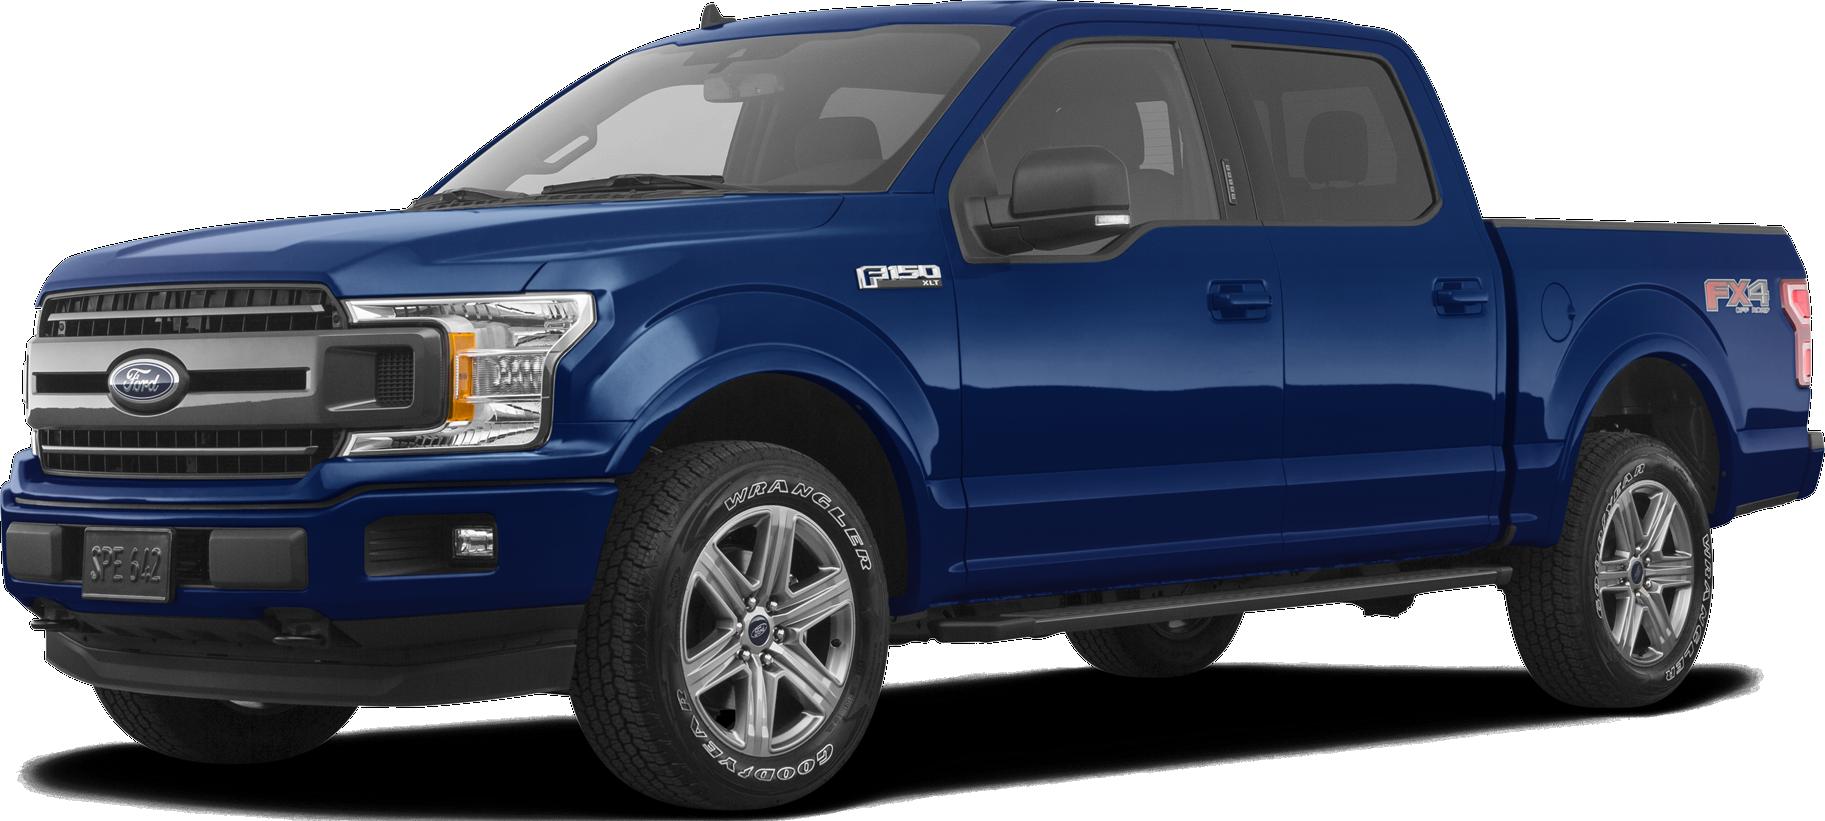 2018 Ram 1500 Crew Cab   Pricing, Ratings, Expert Review